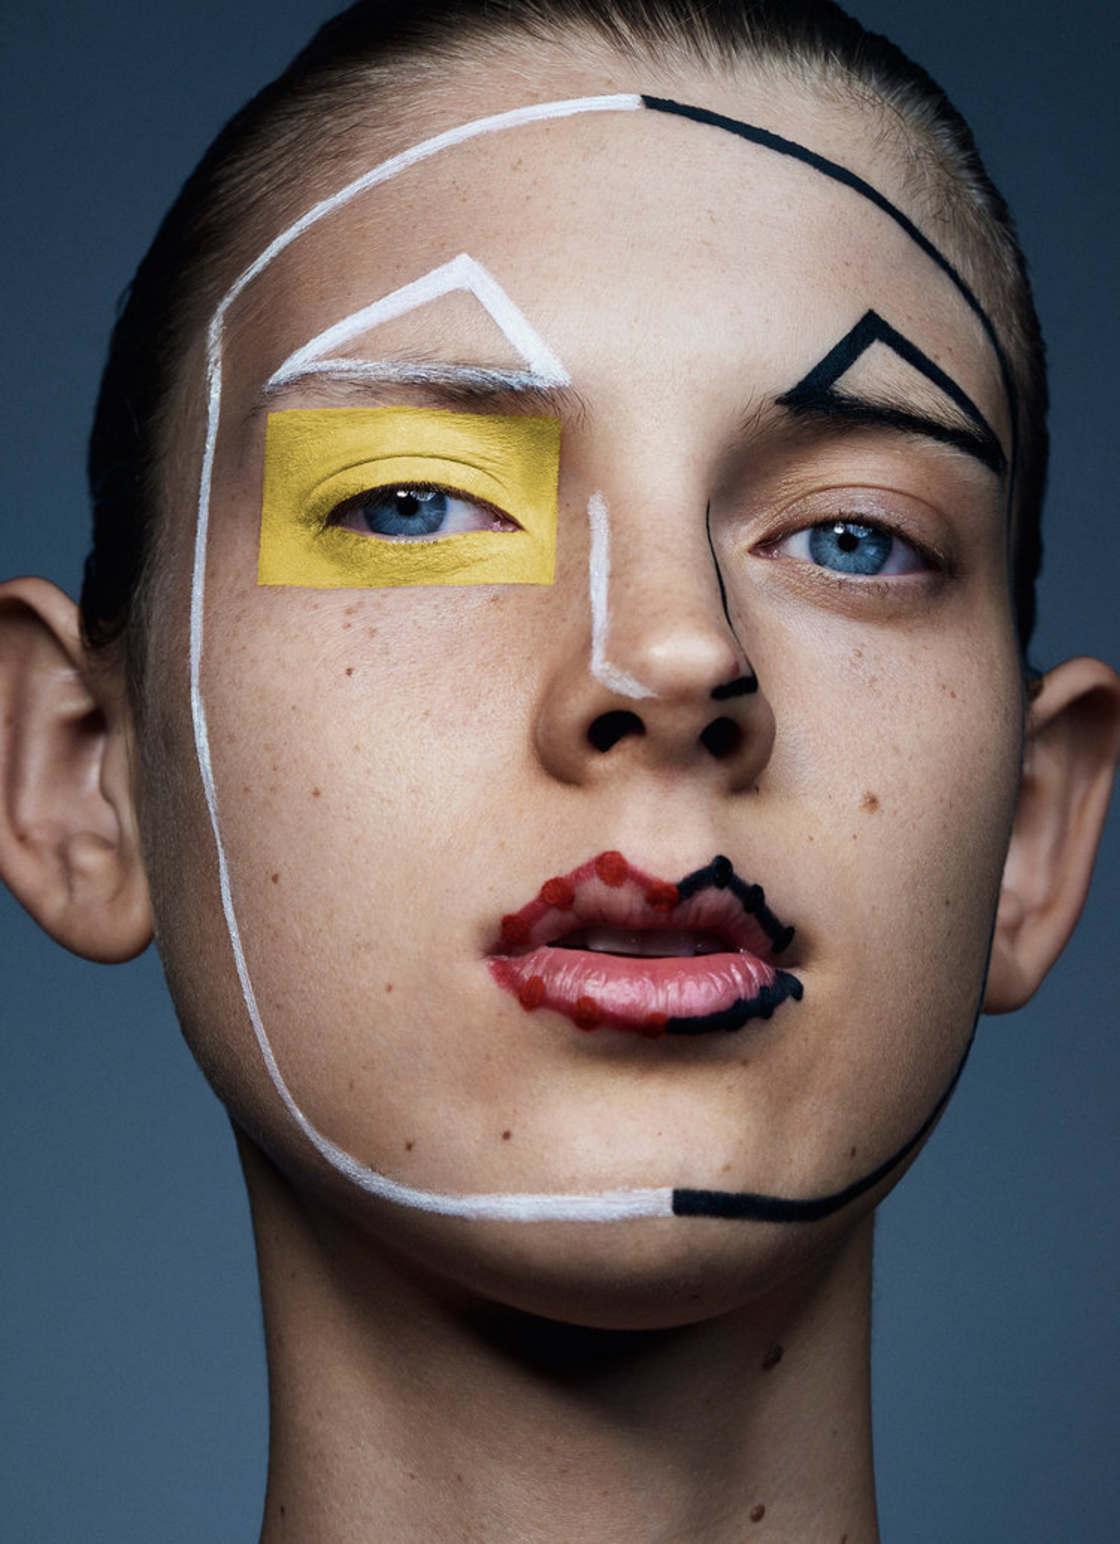 Coordinates - The experimental makeups of Sharif Hamza